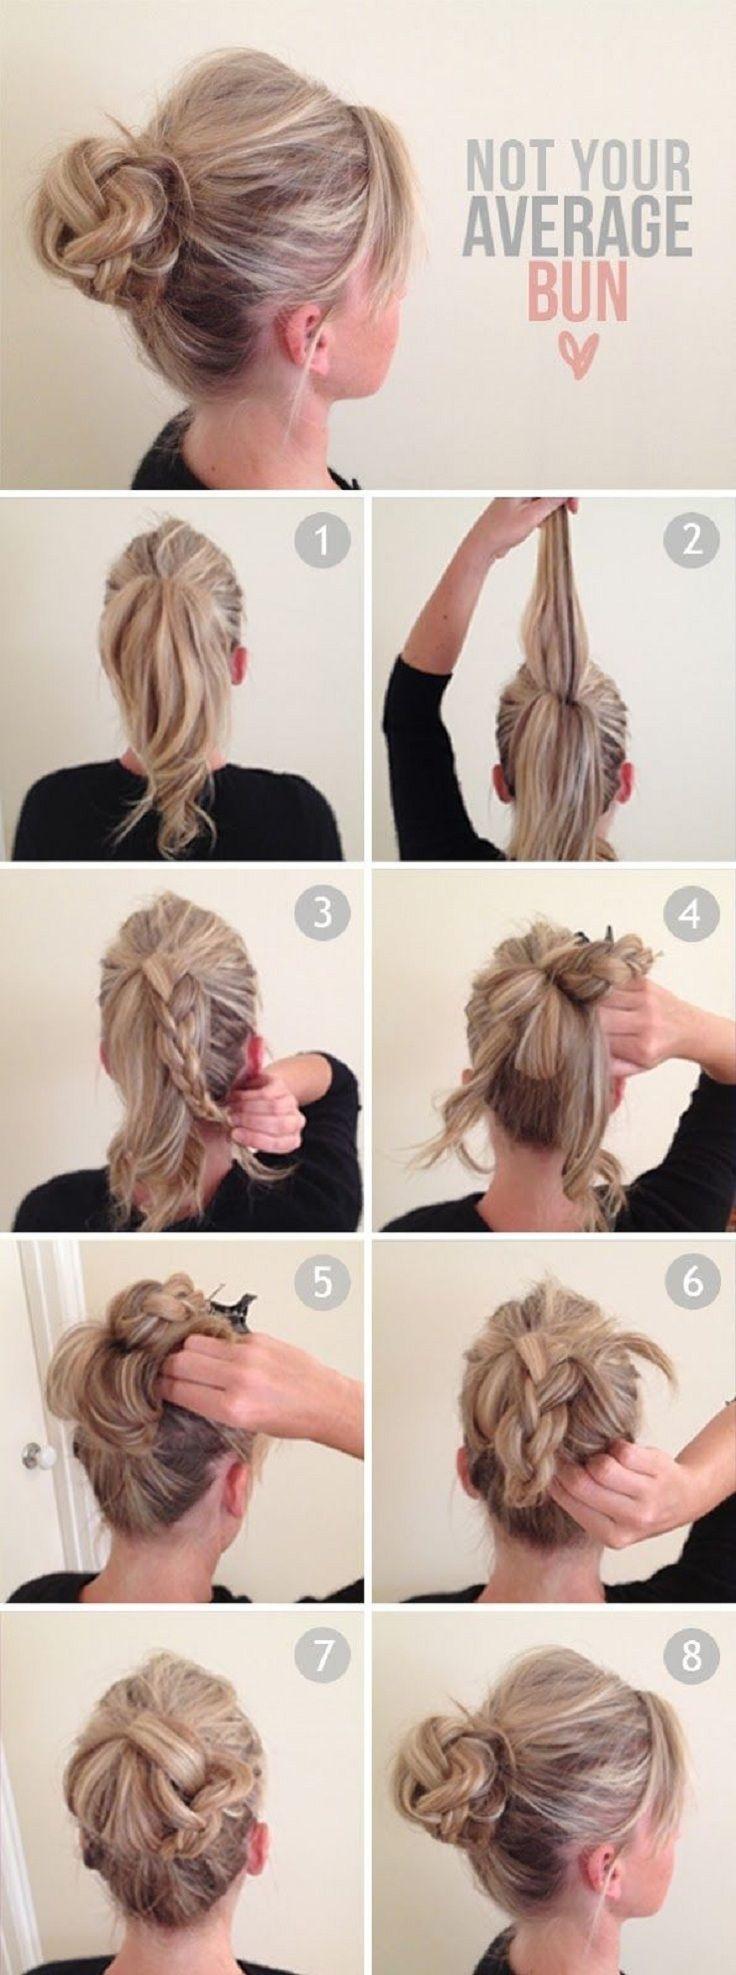 480 best wedding hair, don't care images on pinterest | love